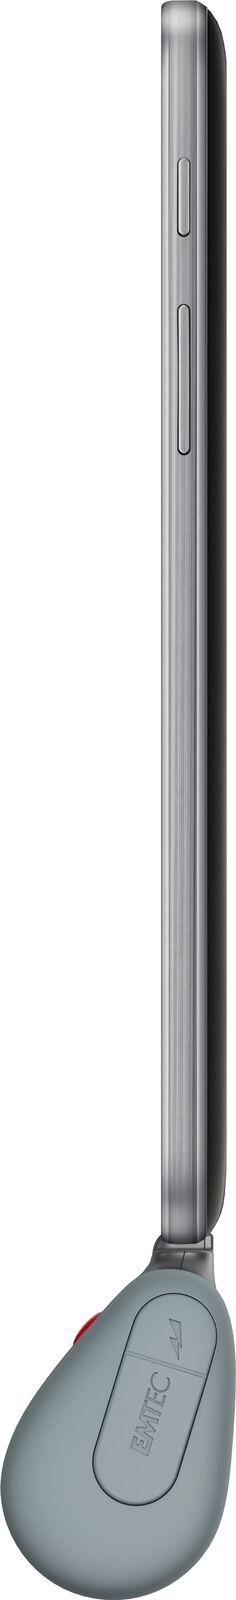 Power Bank Power Clip U400 Android/Windows Emtec 3126170131263